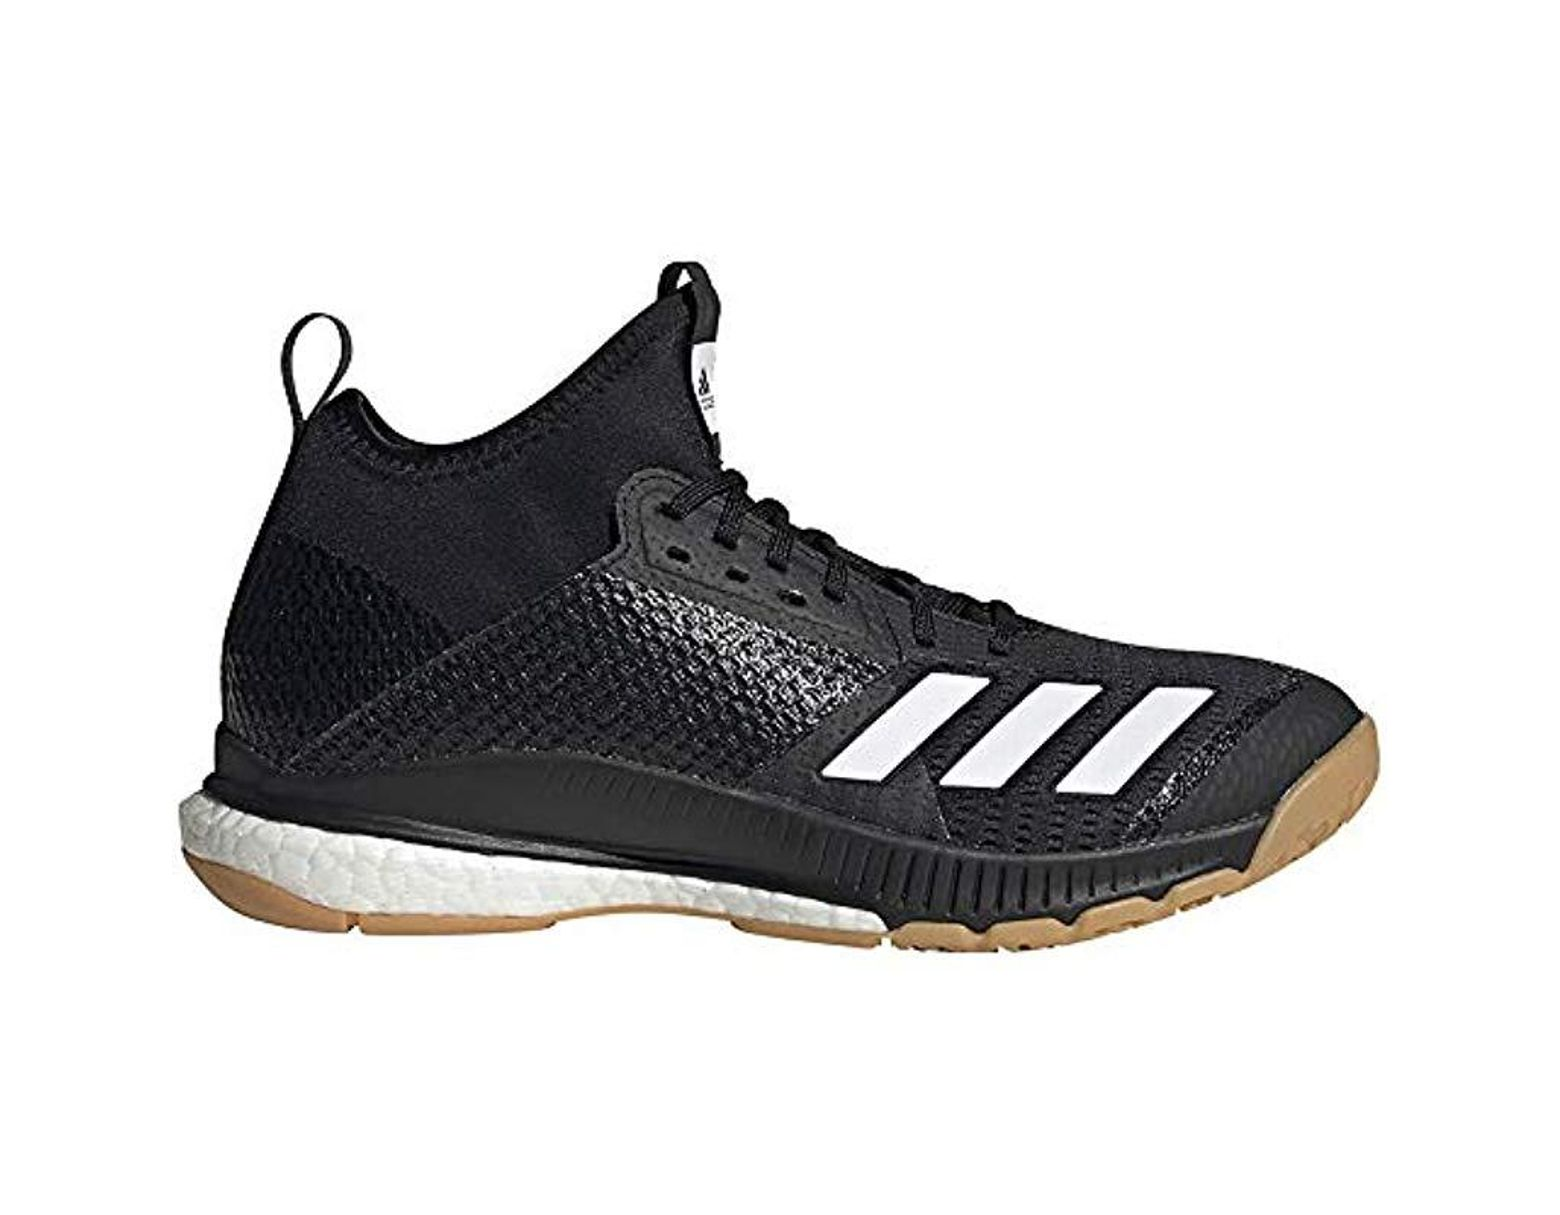 8c70ce75824d3 Women's Black Crazyflight X 3 Mid Volleyball Shoe